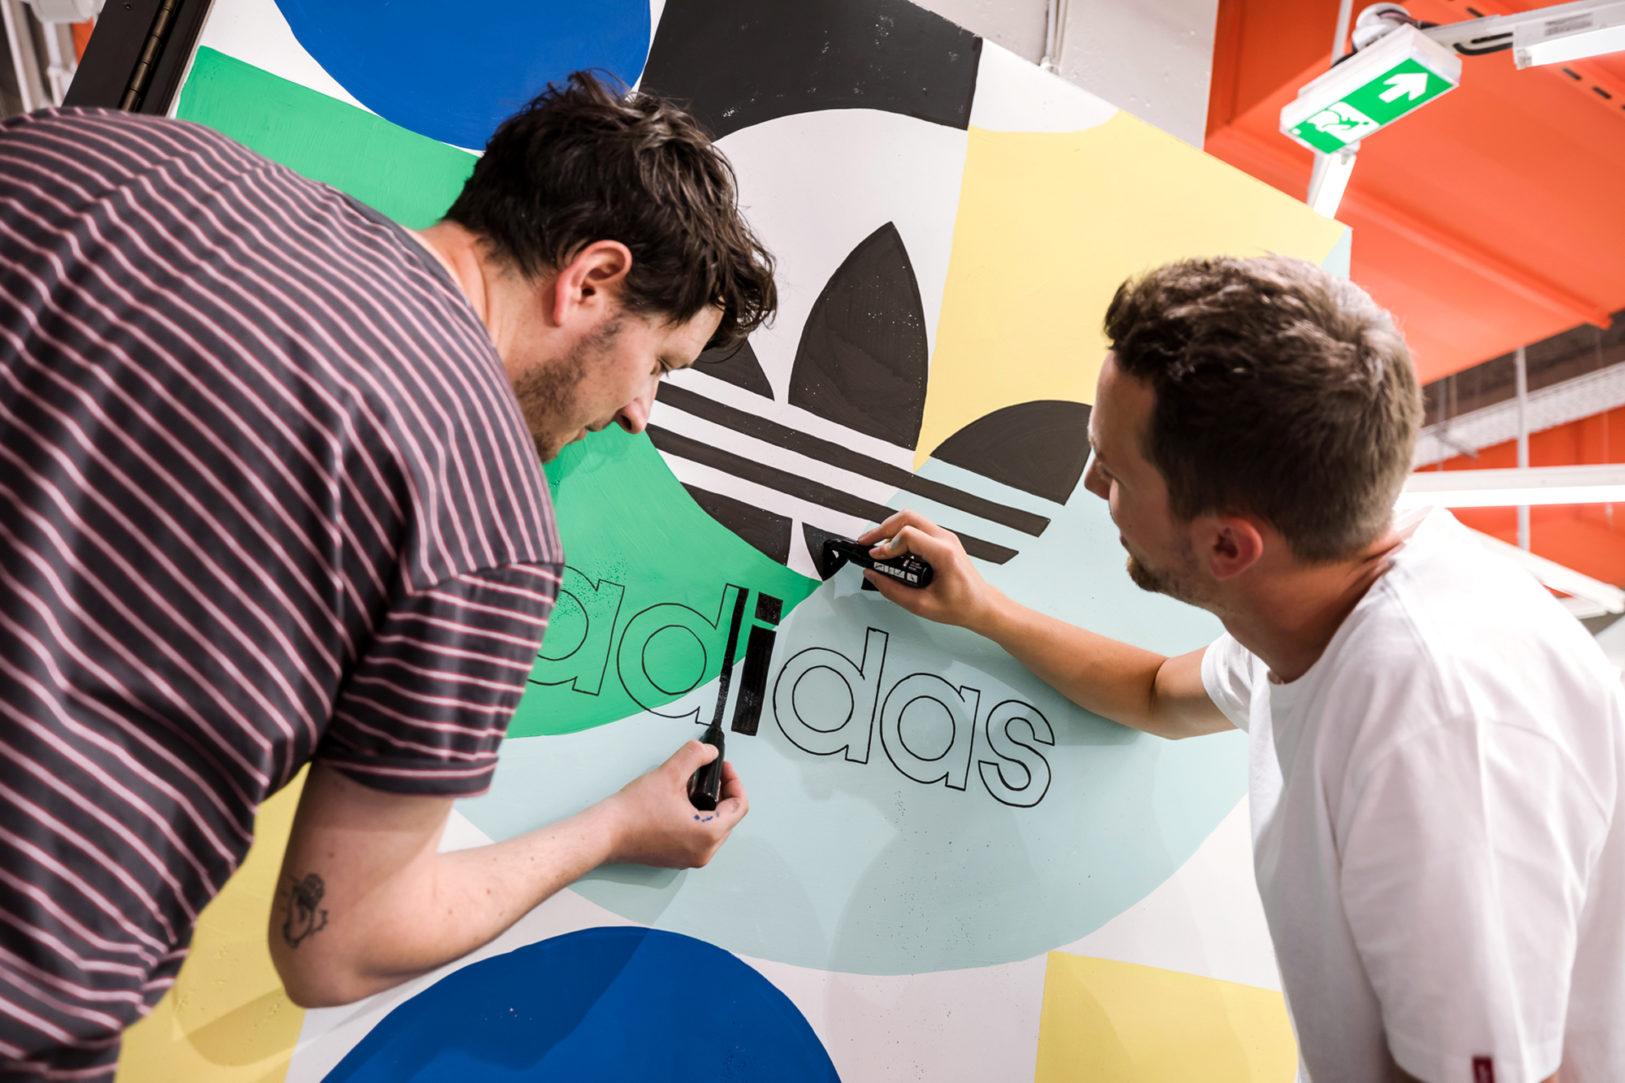 20170708-Retail3D-Adidas-GraphCitadiumCE-28